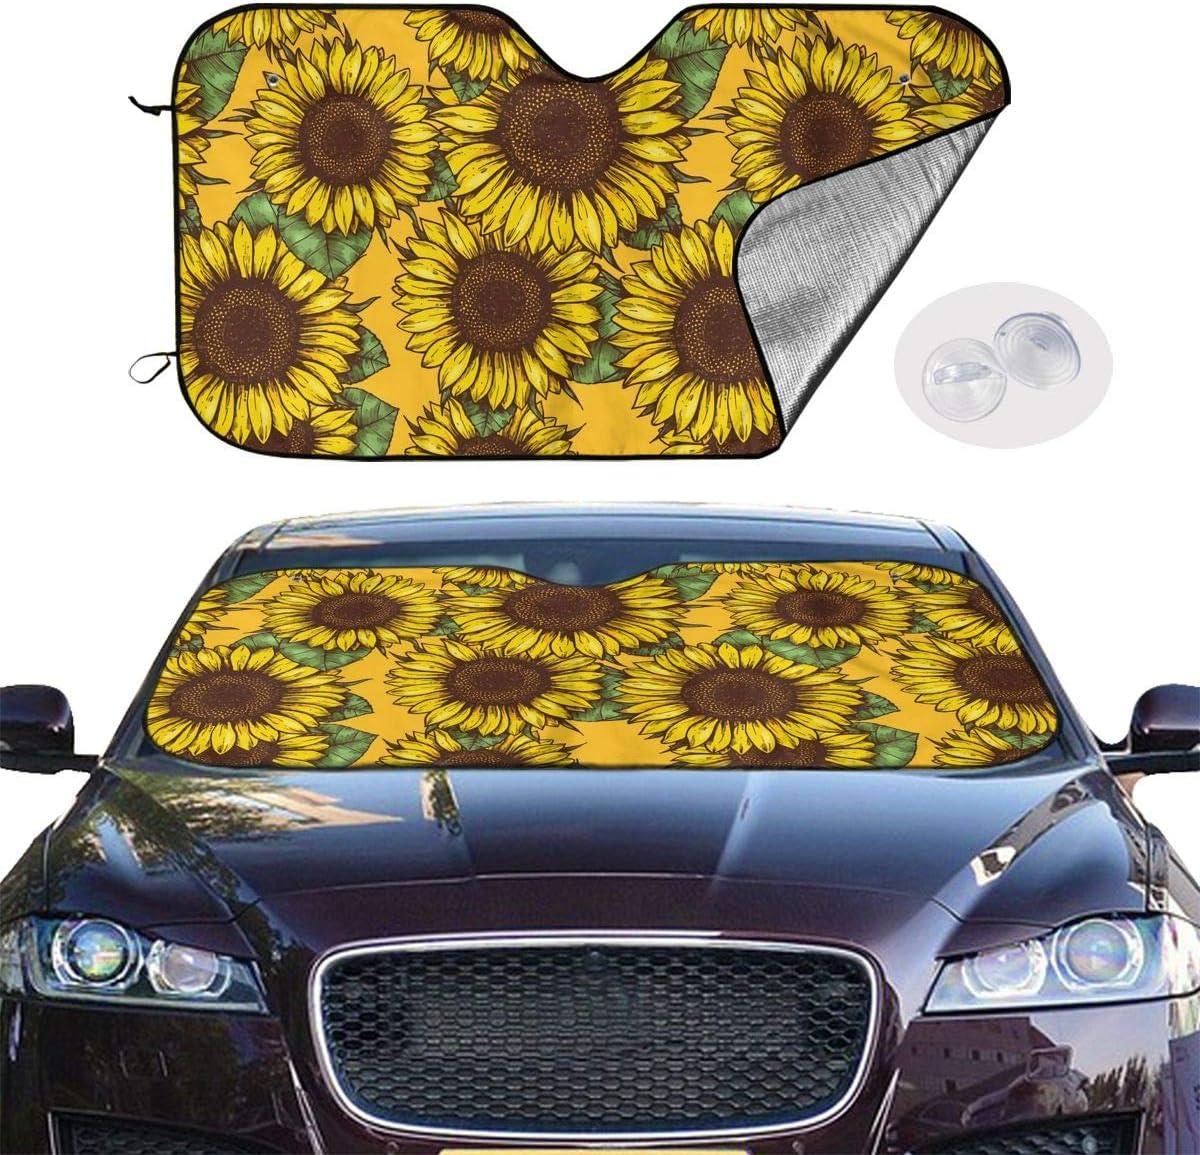 Sunflower Power Windshield Sun Shade,Car Window Shade Car Windshield Sun Shade Keep Vehicle Cool and Prevent Sun Exposure Car Sun Shade for Windshield Shabby Chic